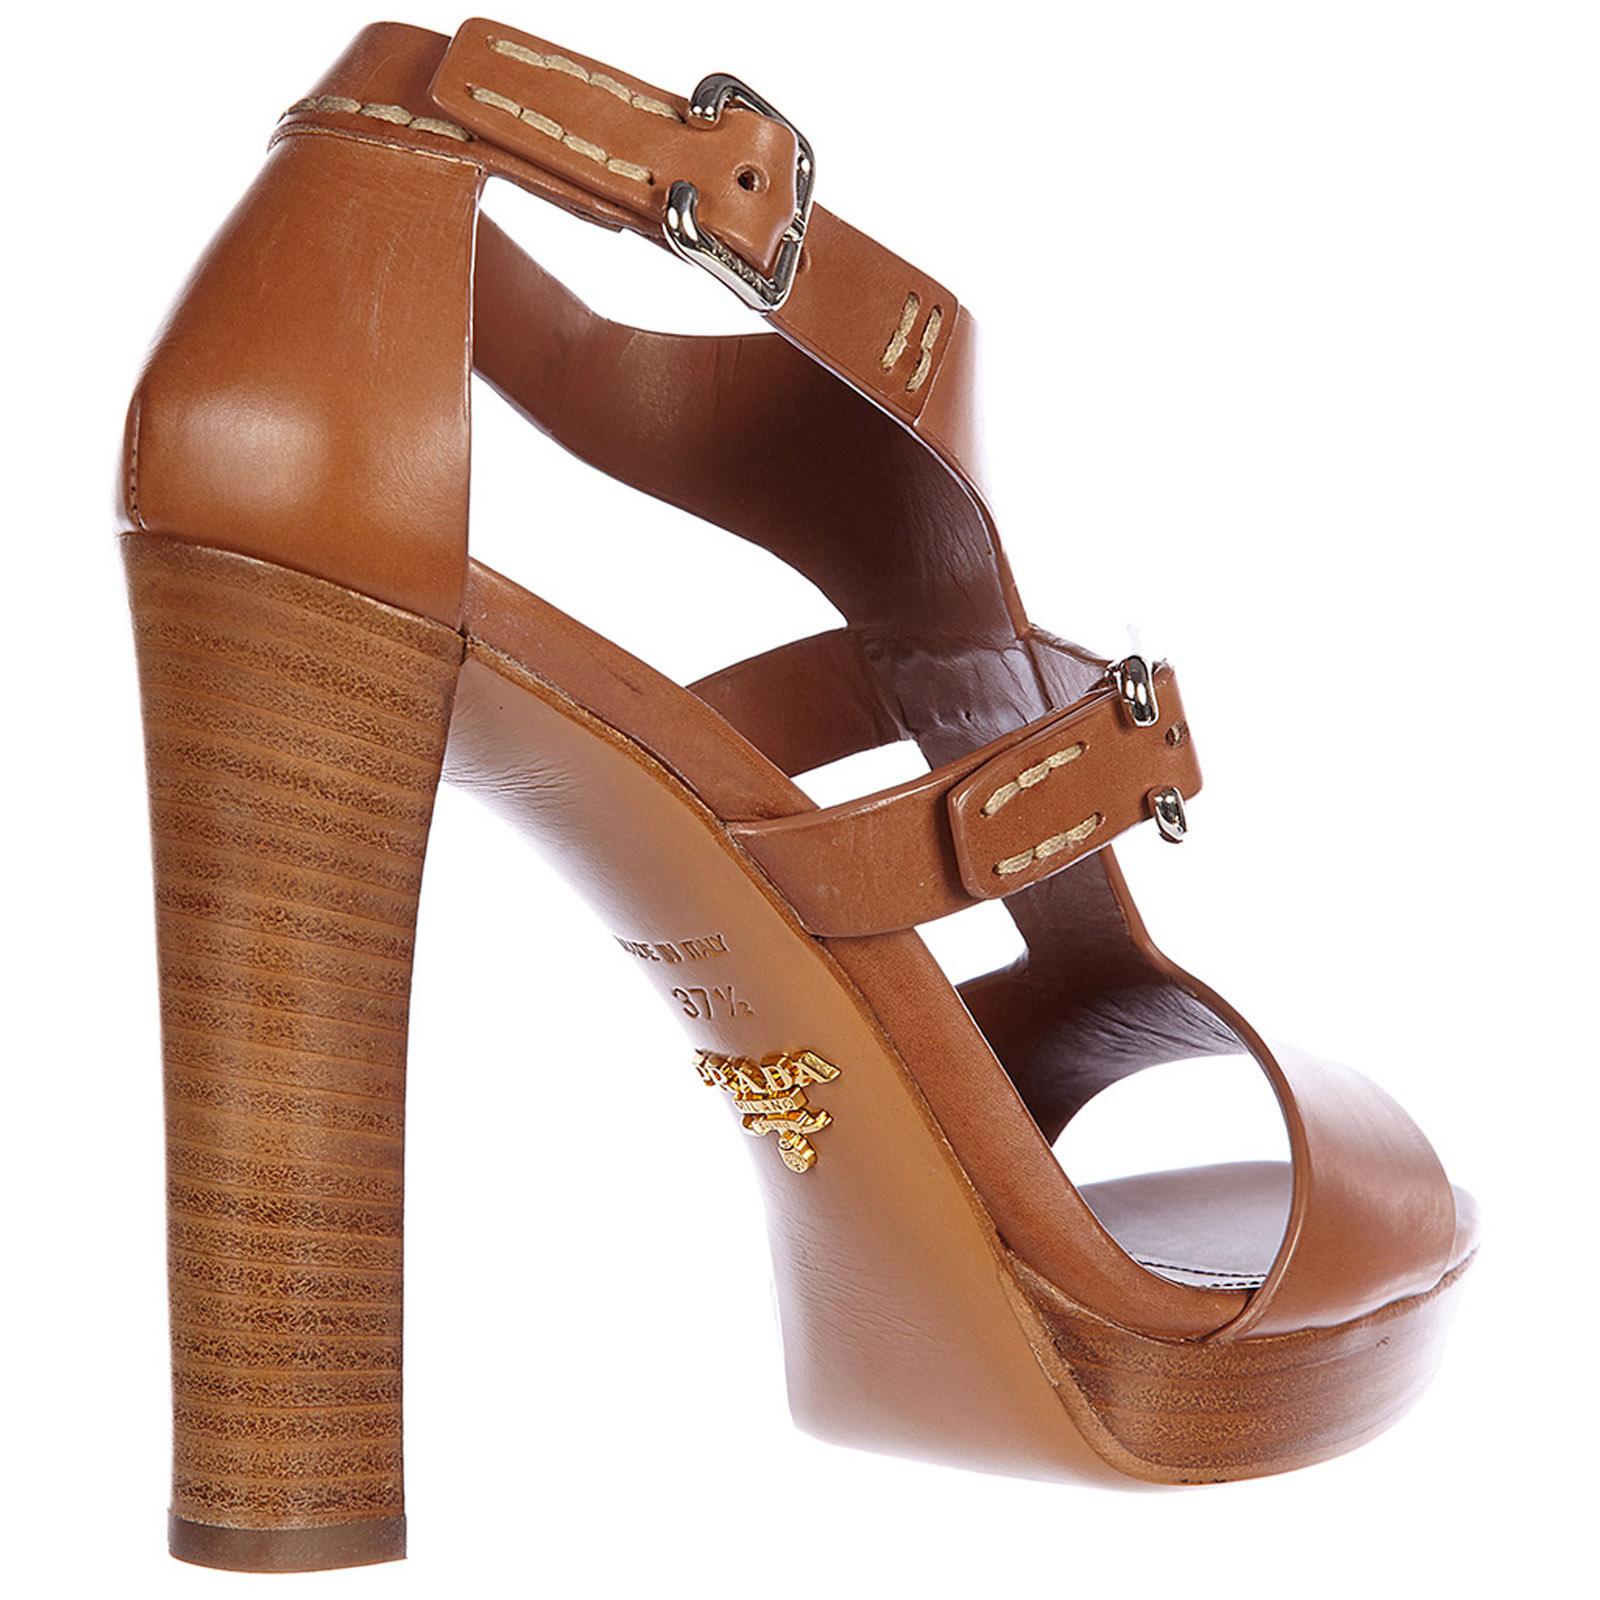 Damen leder sandalen mit absatz sandaletten vitello lux